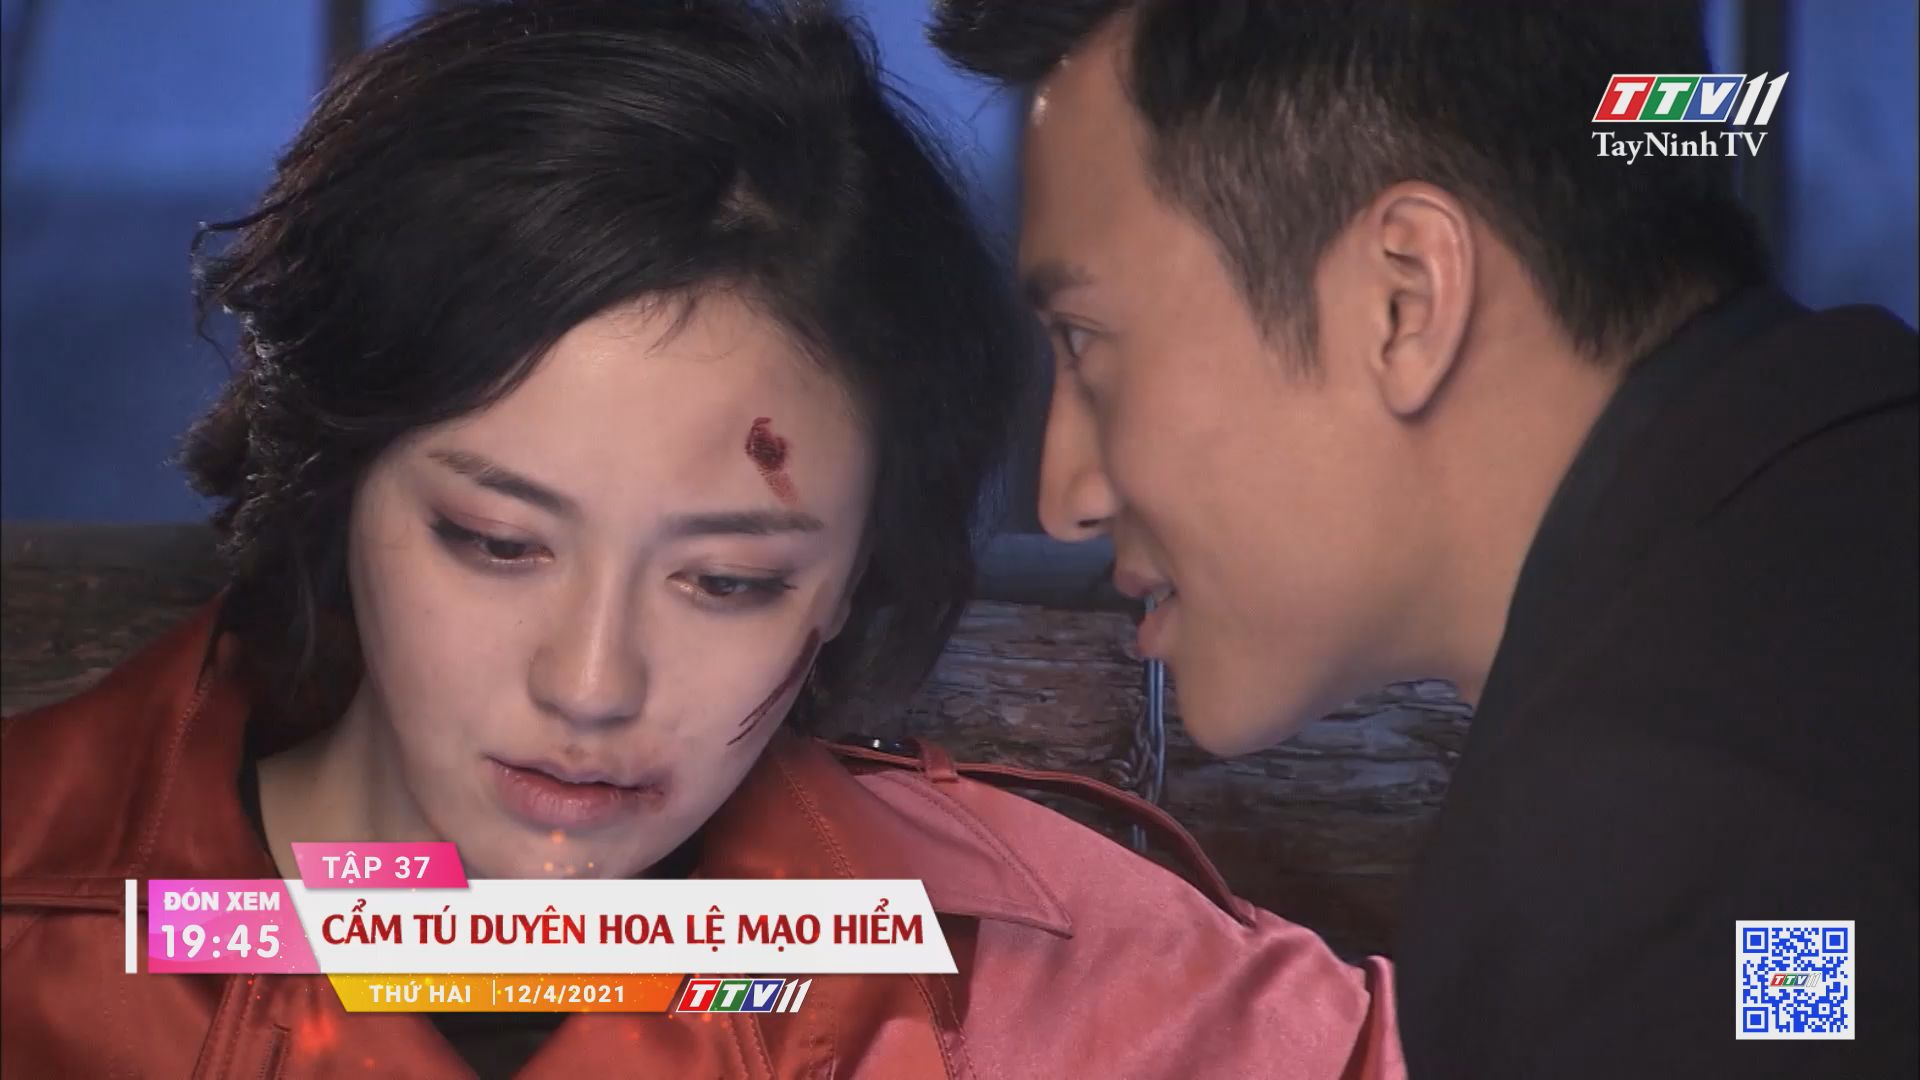 Cẩm Tú duyên hoa lệ mạo hiểm-Trailer tập 37 | PHIM CẨM TÚ DUYÊN HOA LỆ MẠO HIỂM | TayNinhTVE